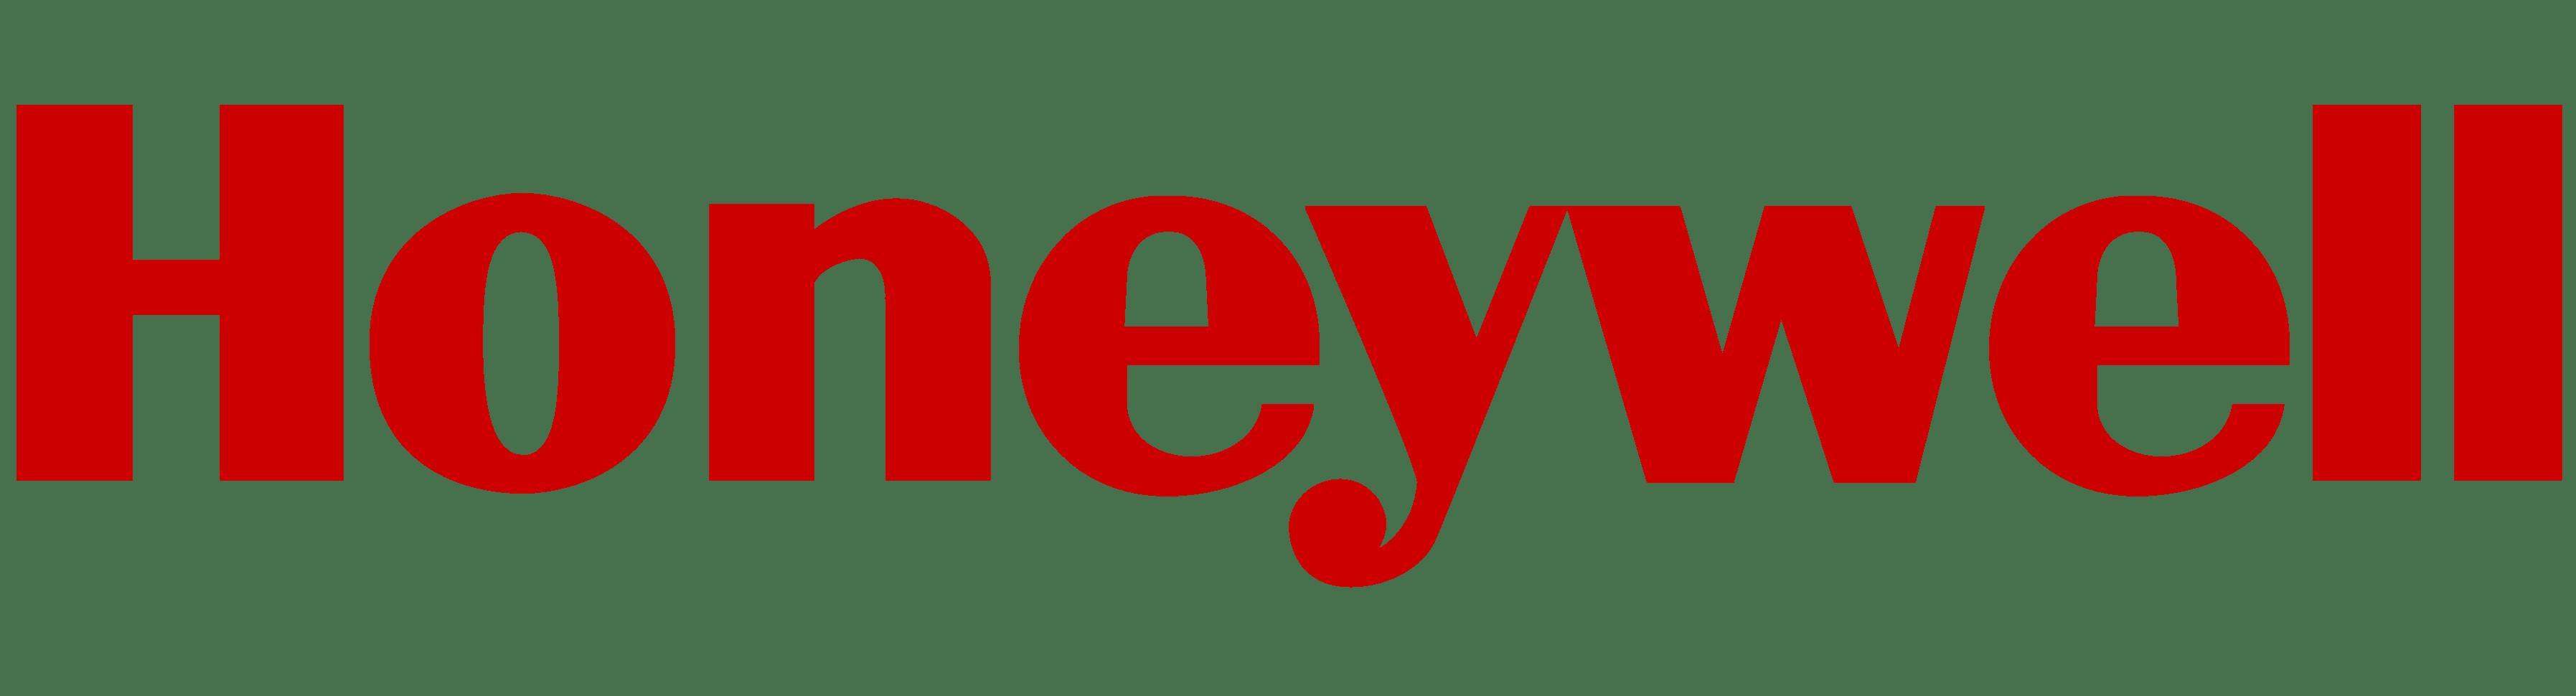 Honeywell_logo